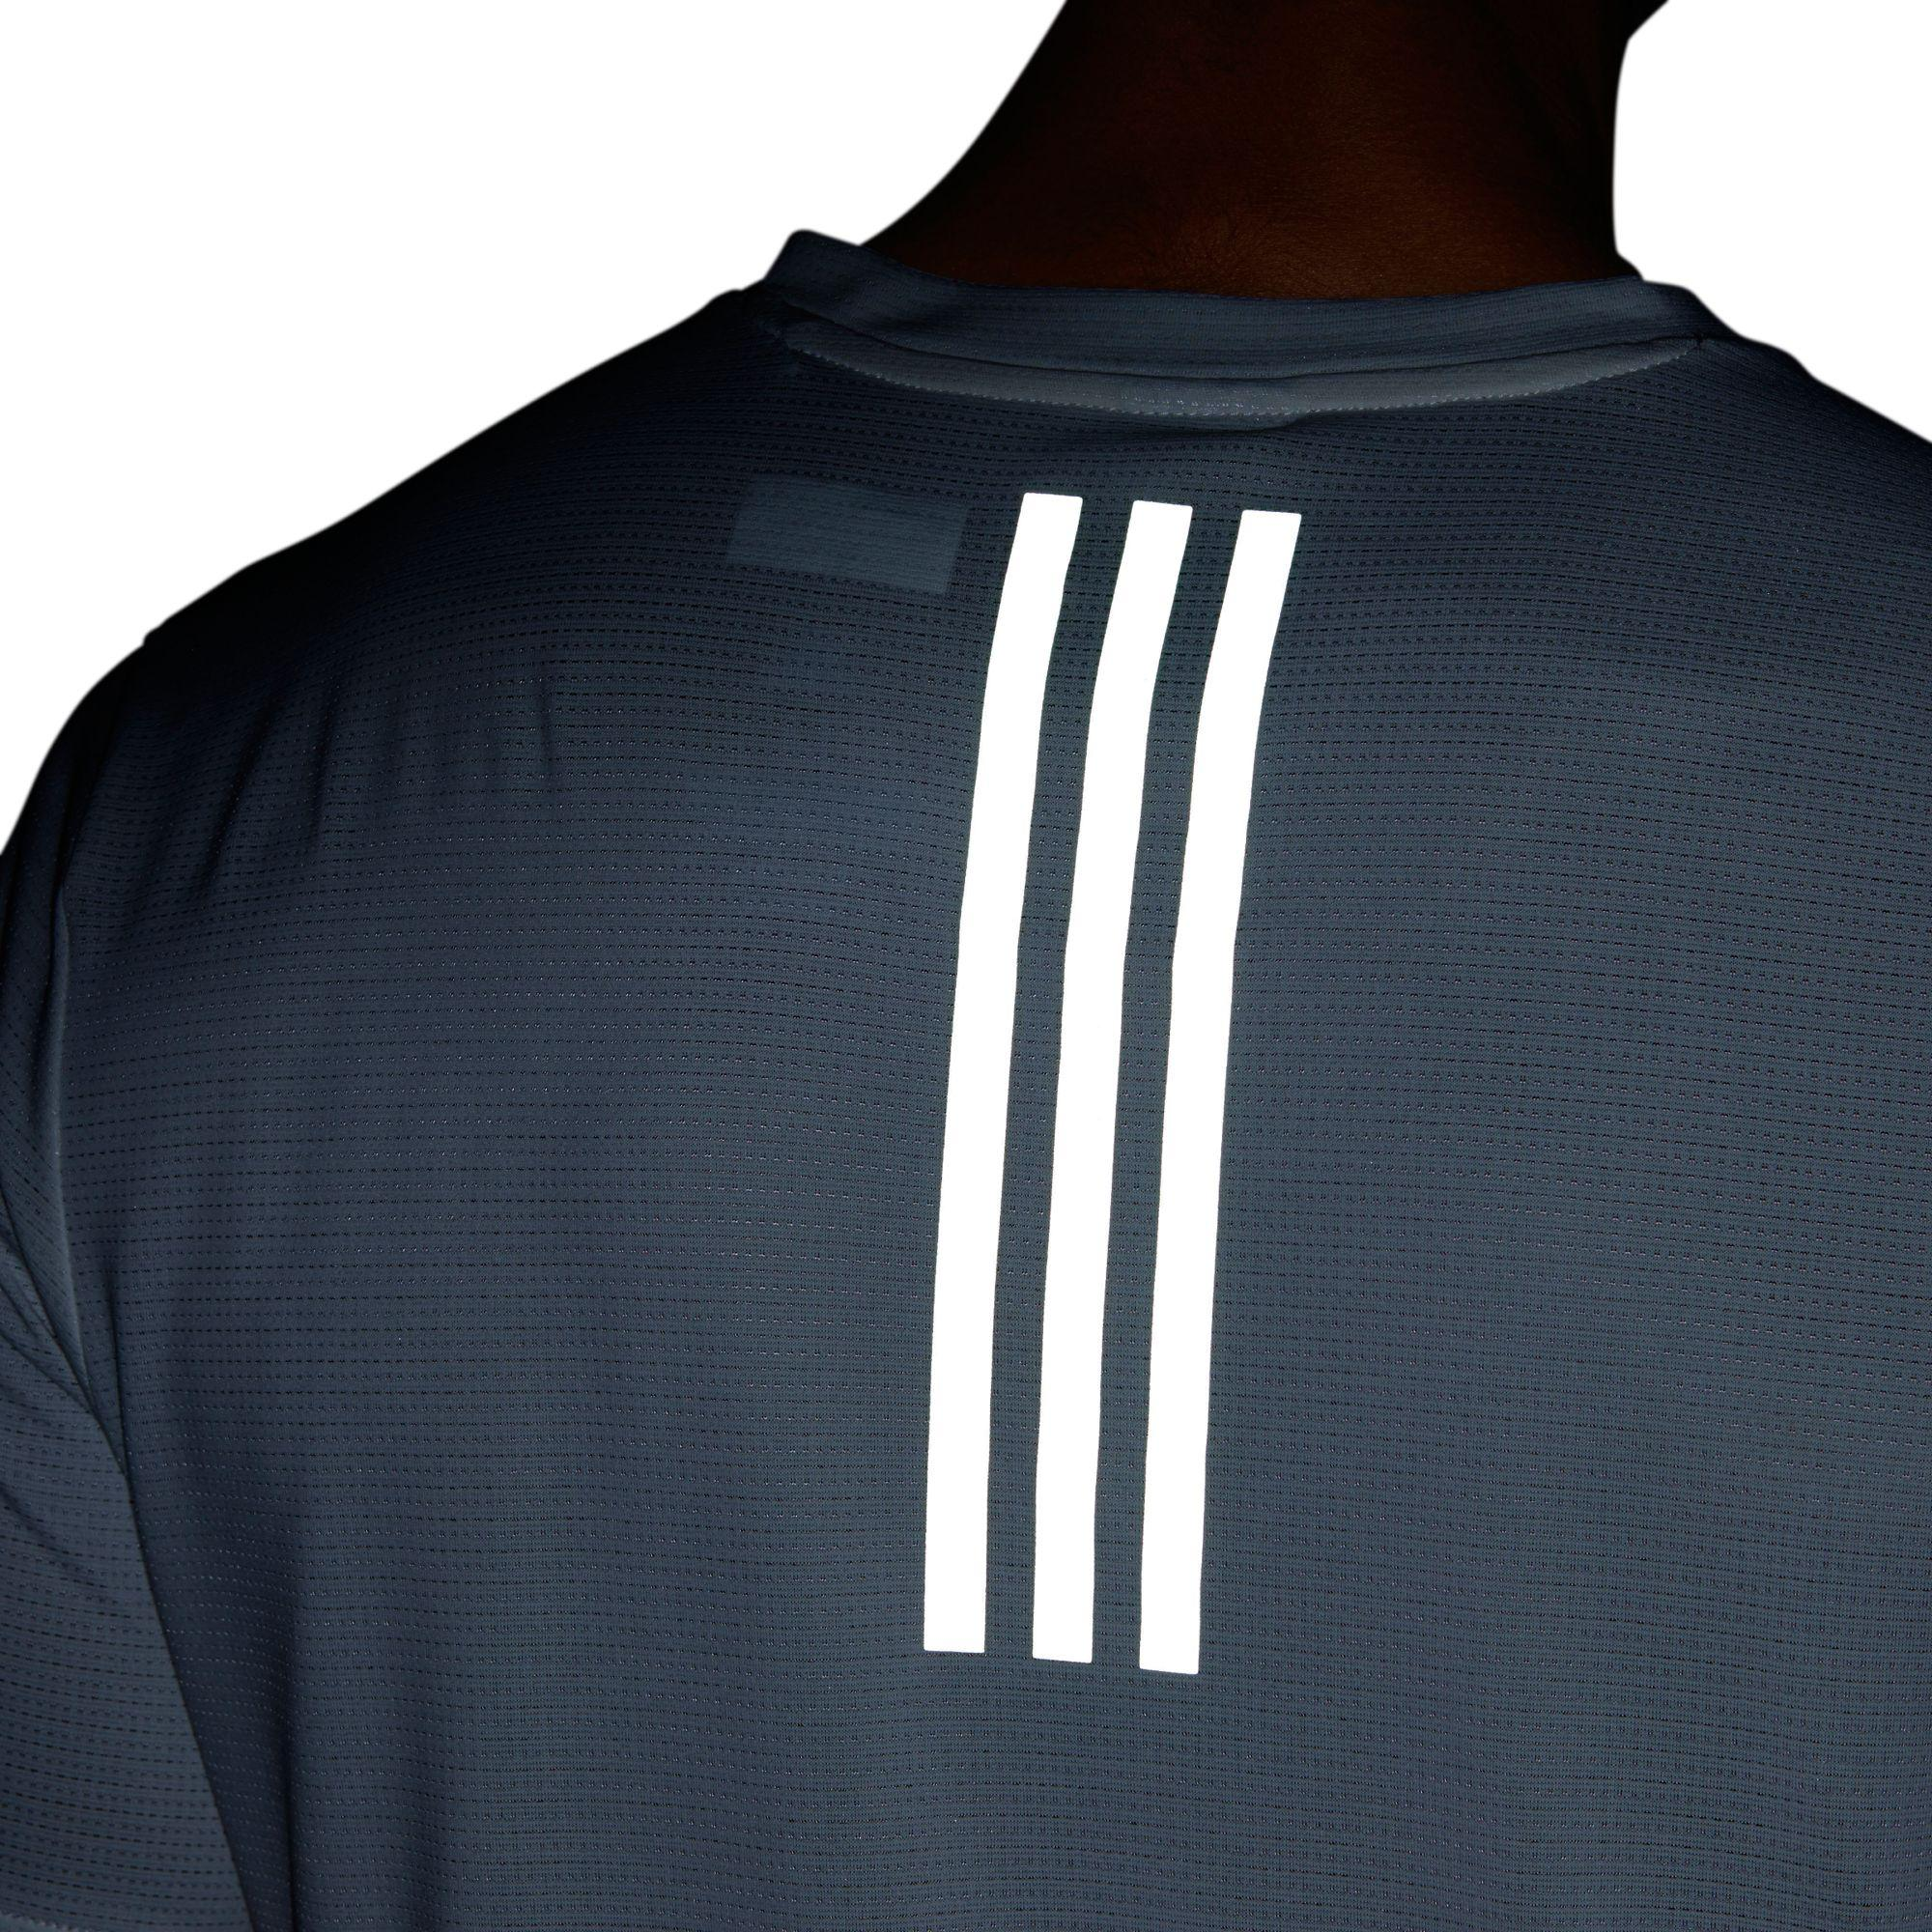 23a16d69089c9 Adidas - White Supernova Running T-shirt for Men - Lyst. View fullscreen